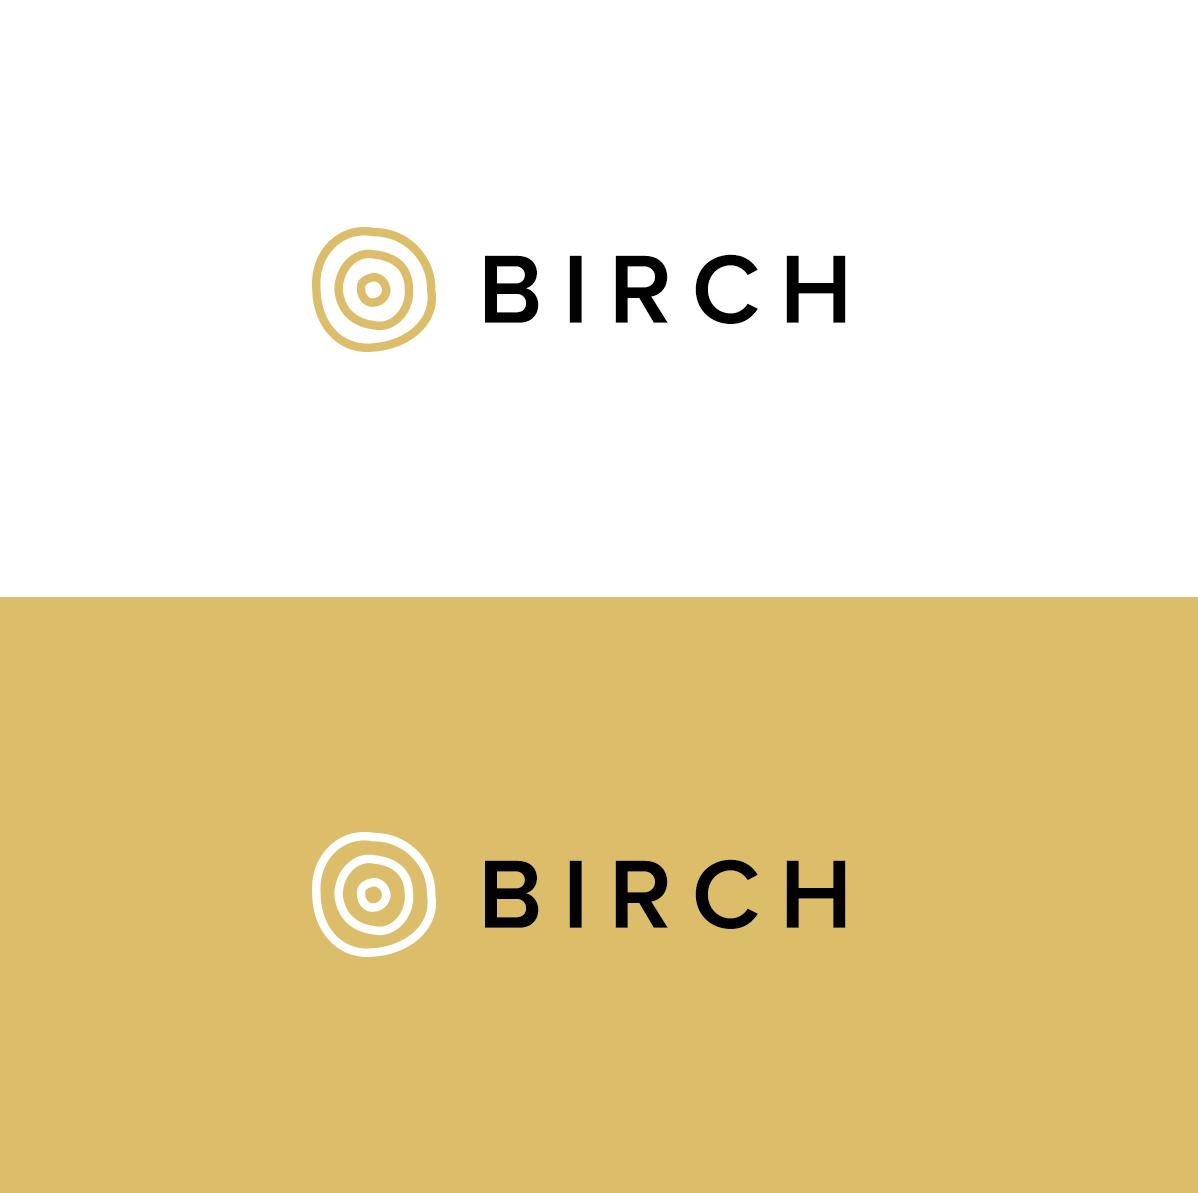 Birch WordPress Theme Logo